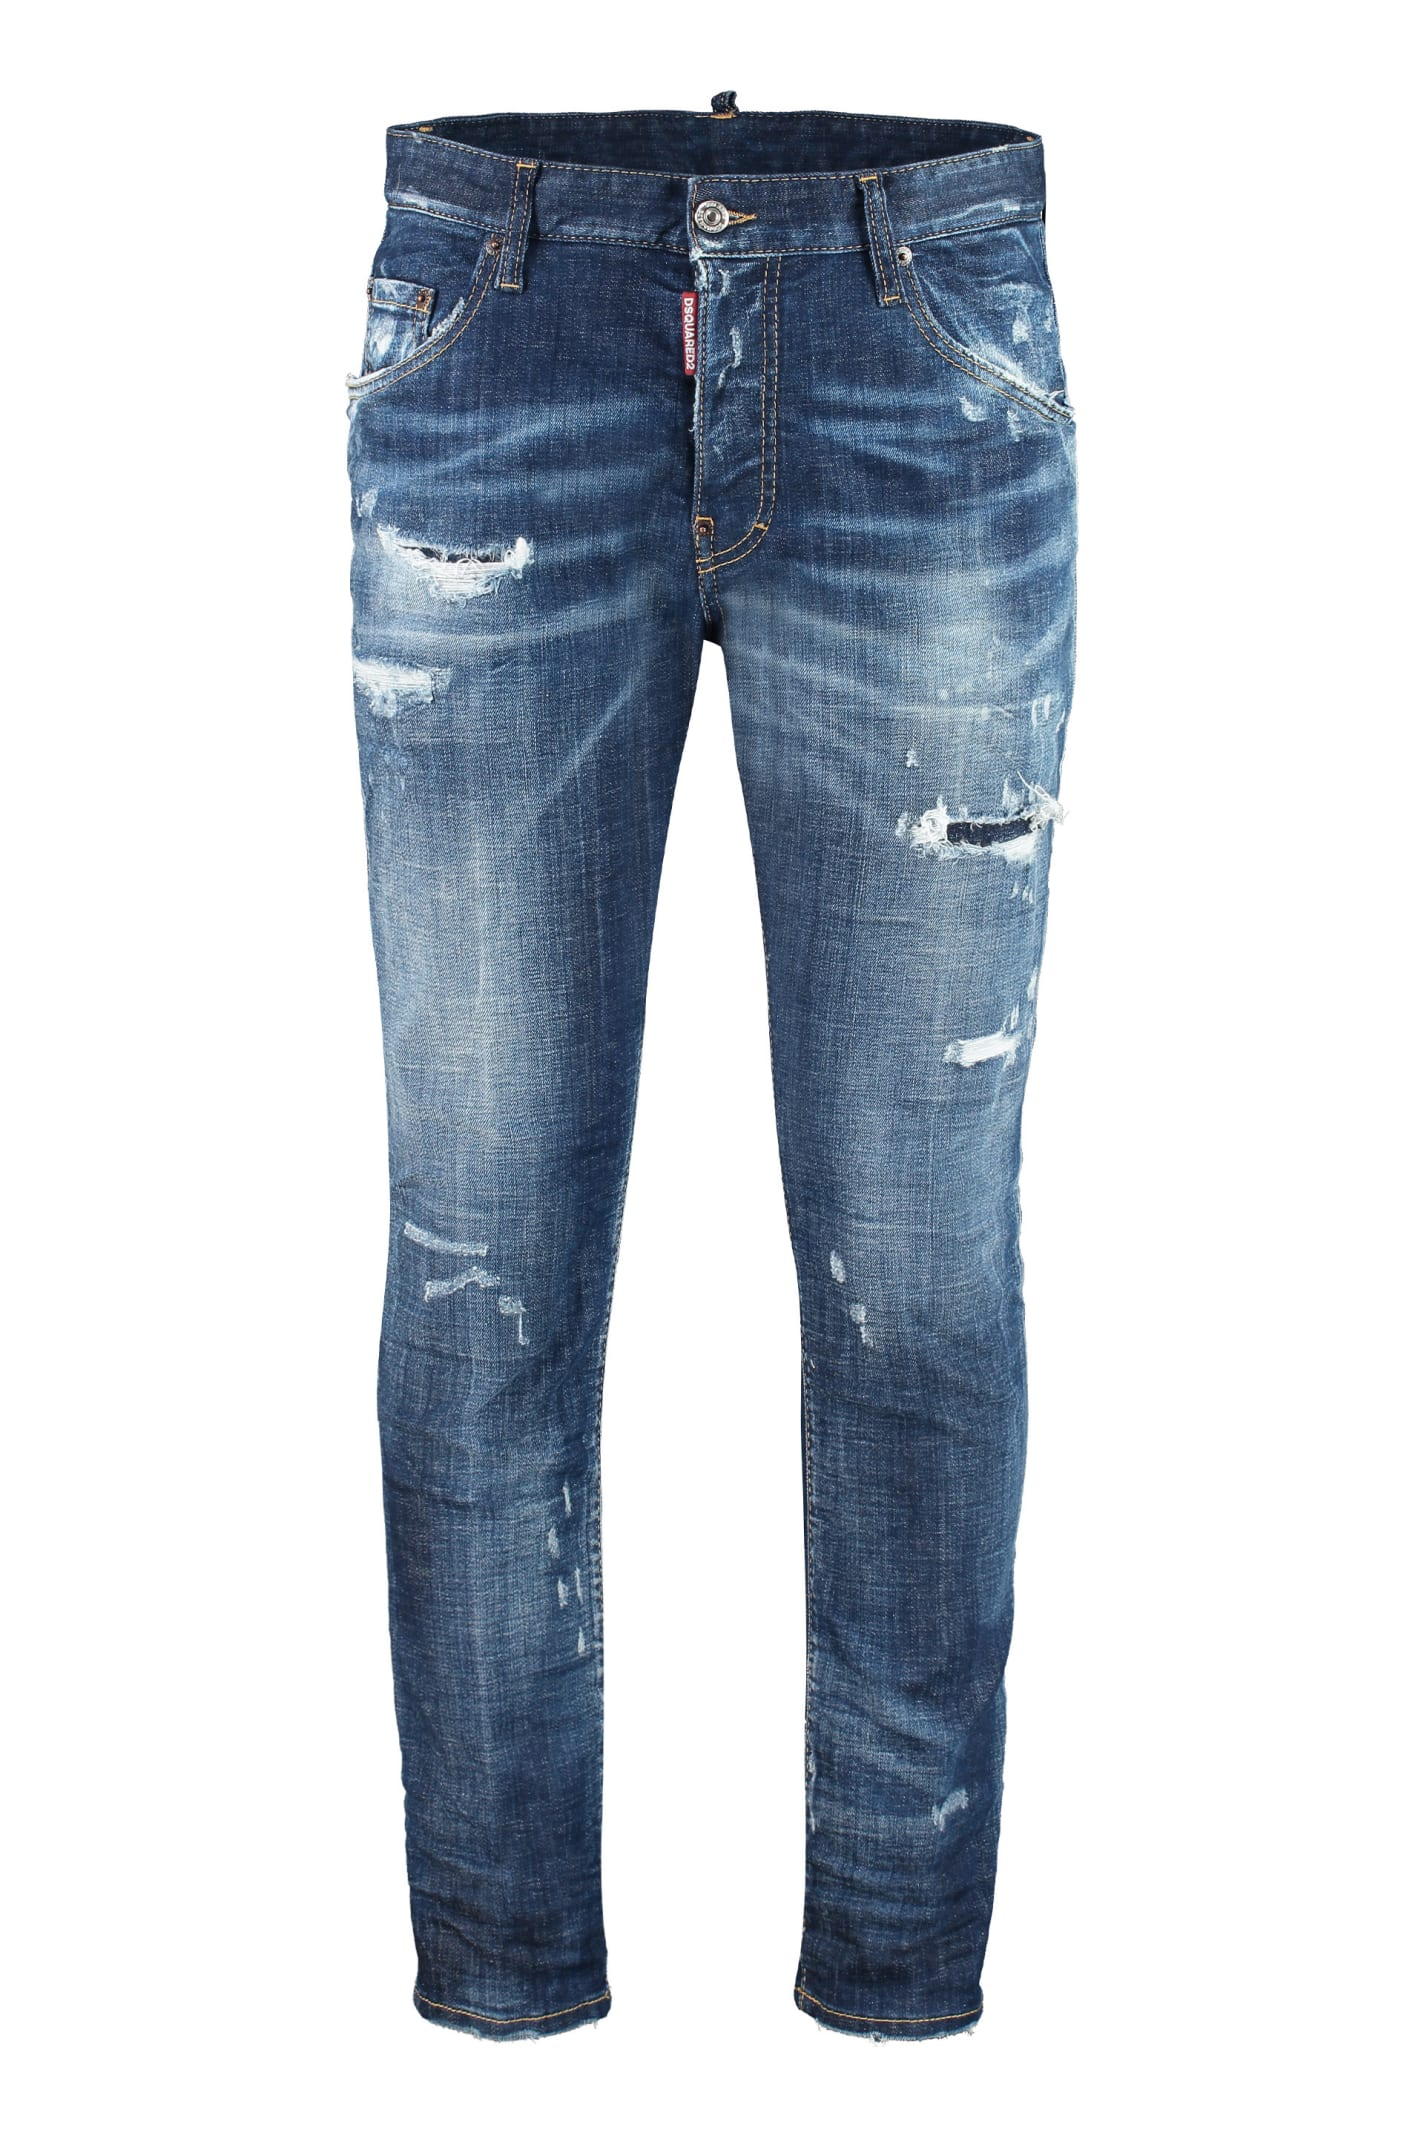 Dsquared2 Skater 5-pocket Jeans